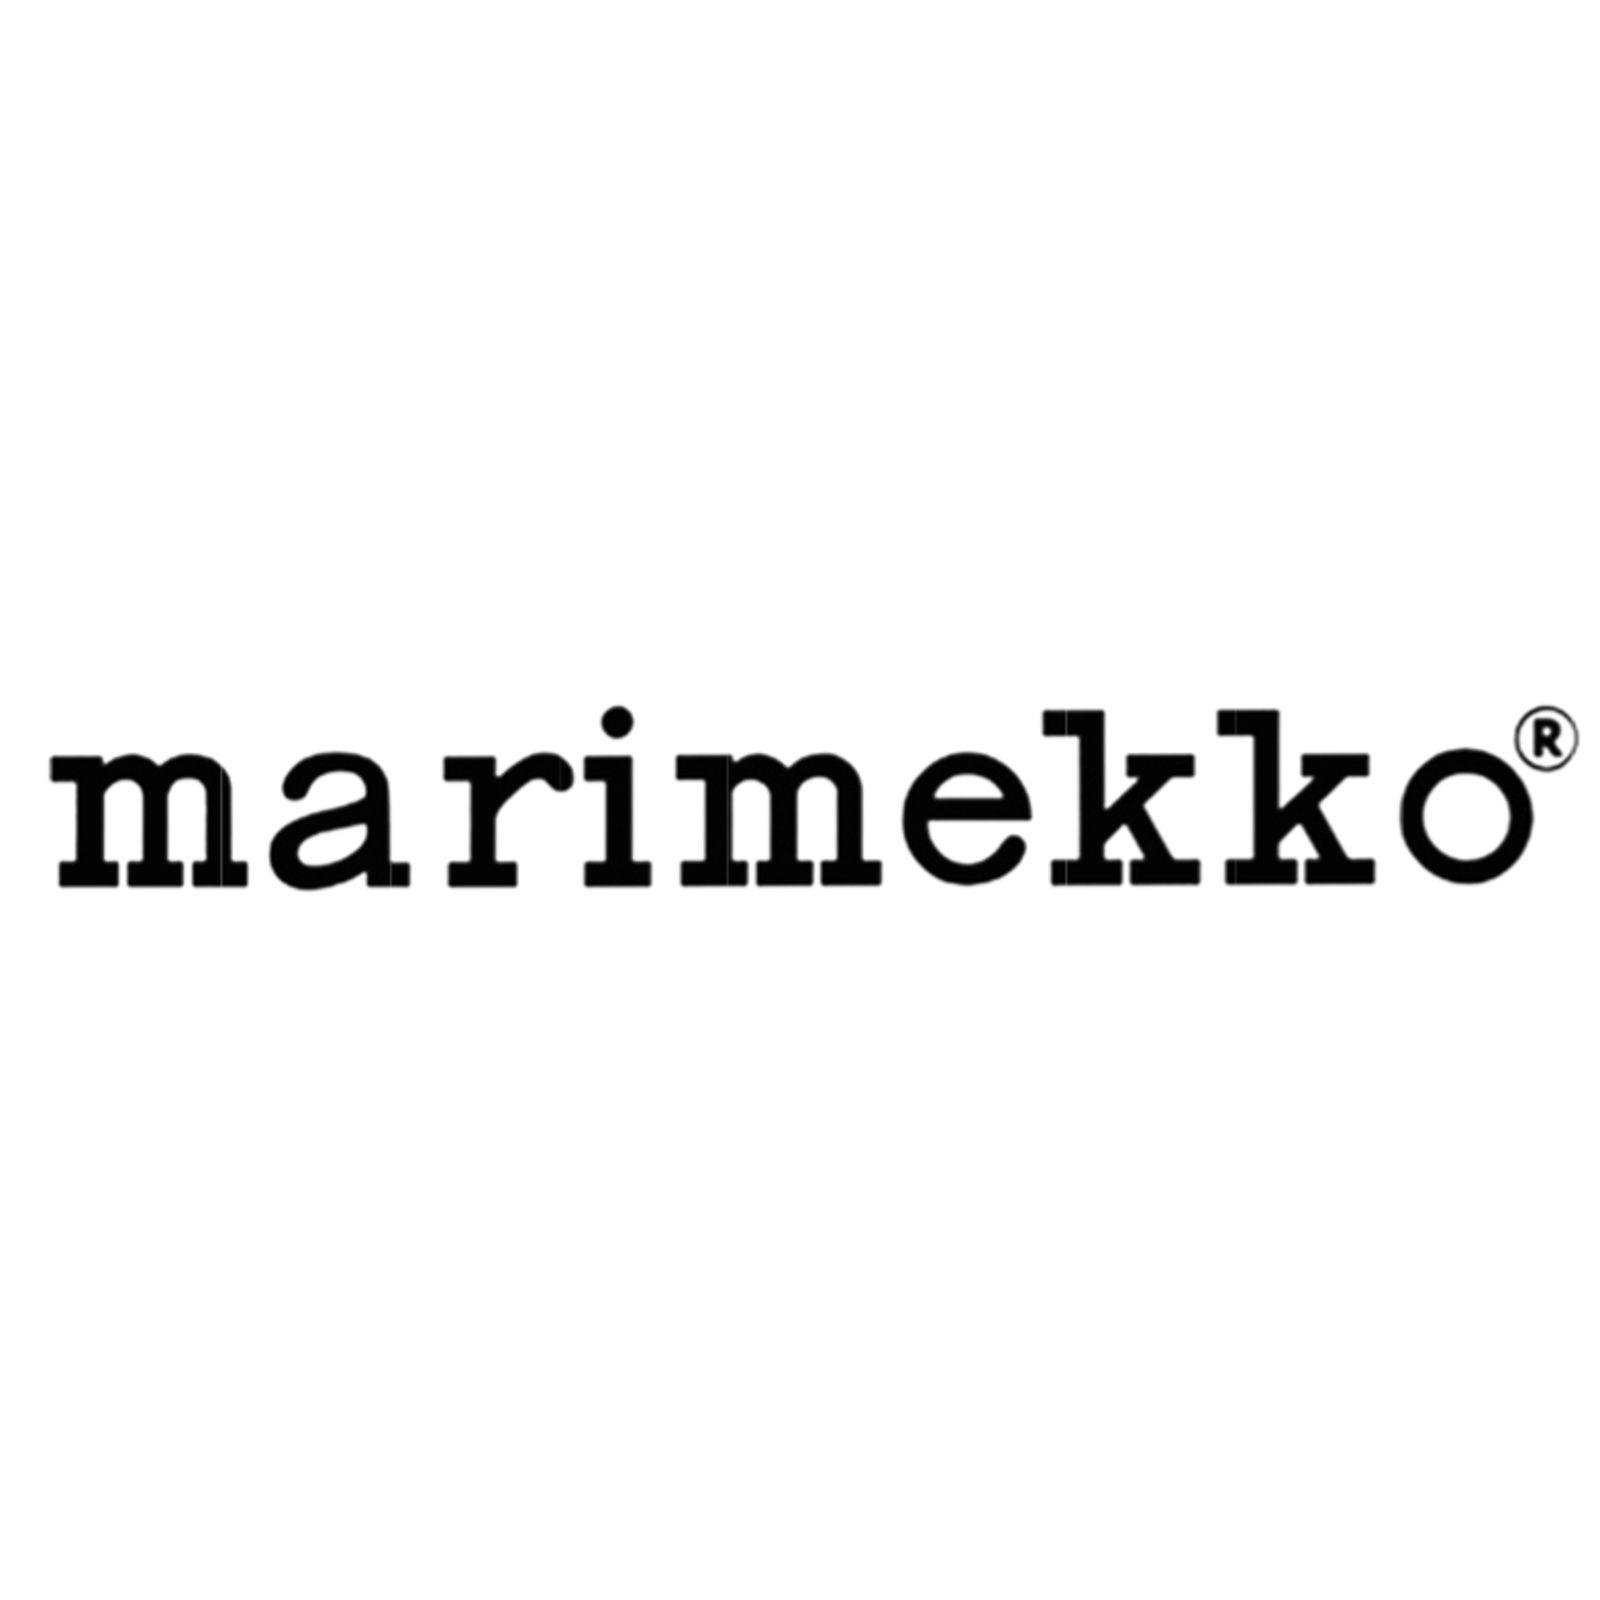 marimekko® (Afbeelding 1)